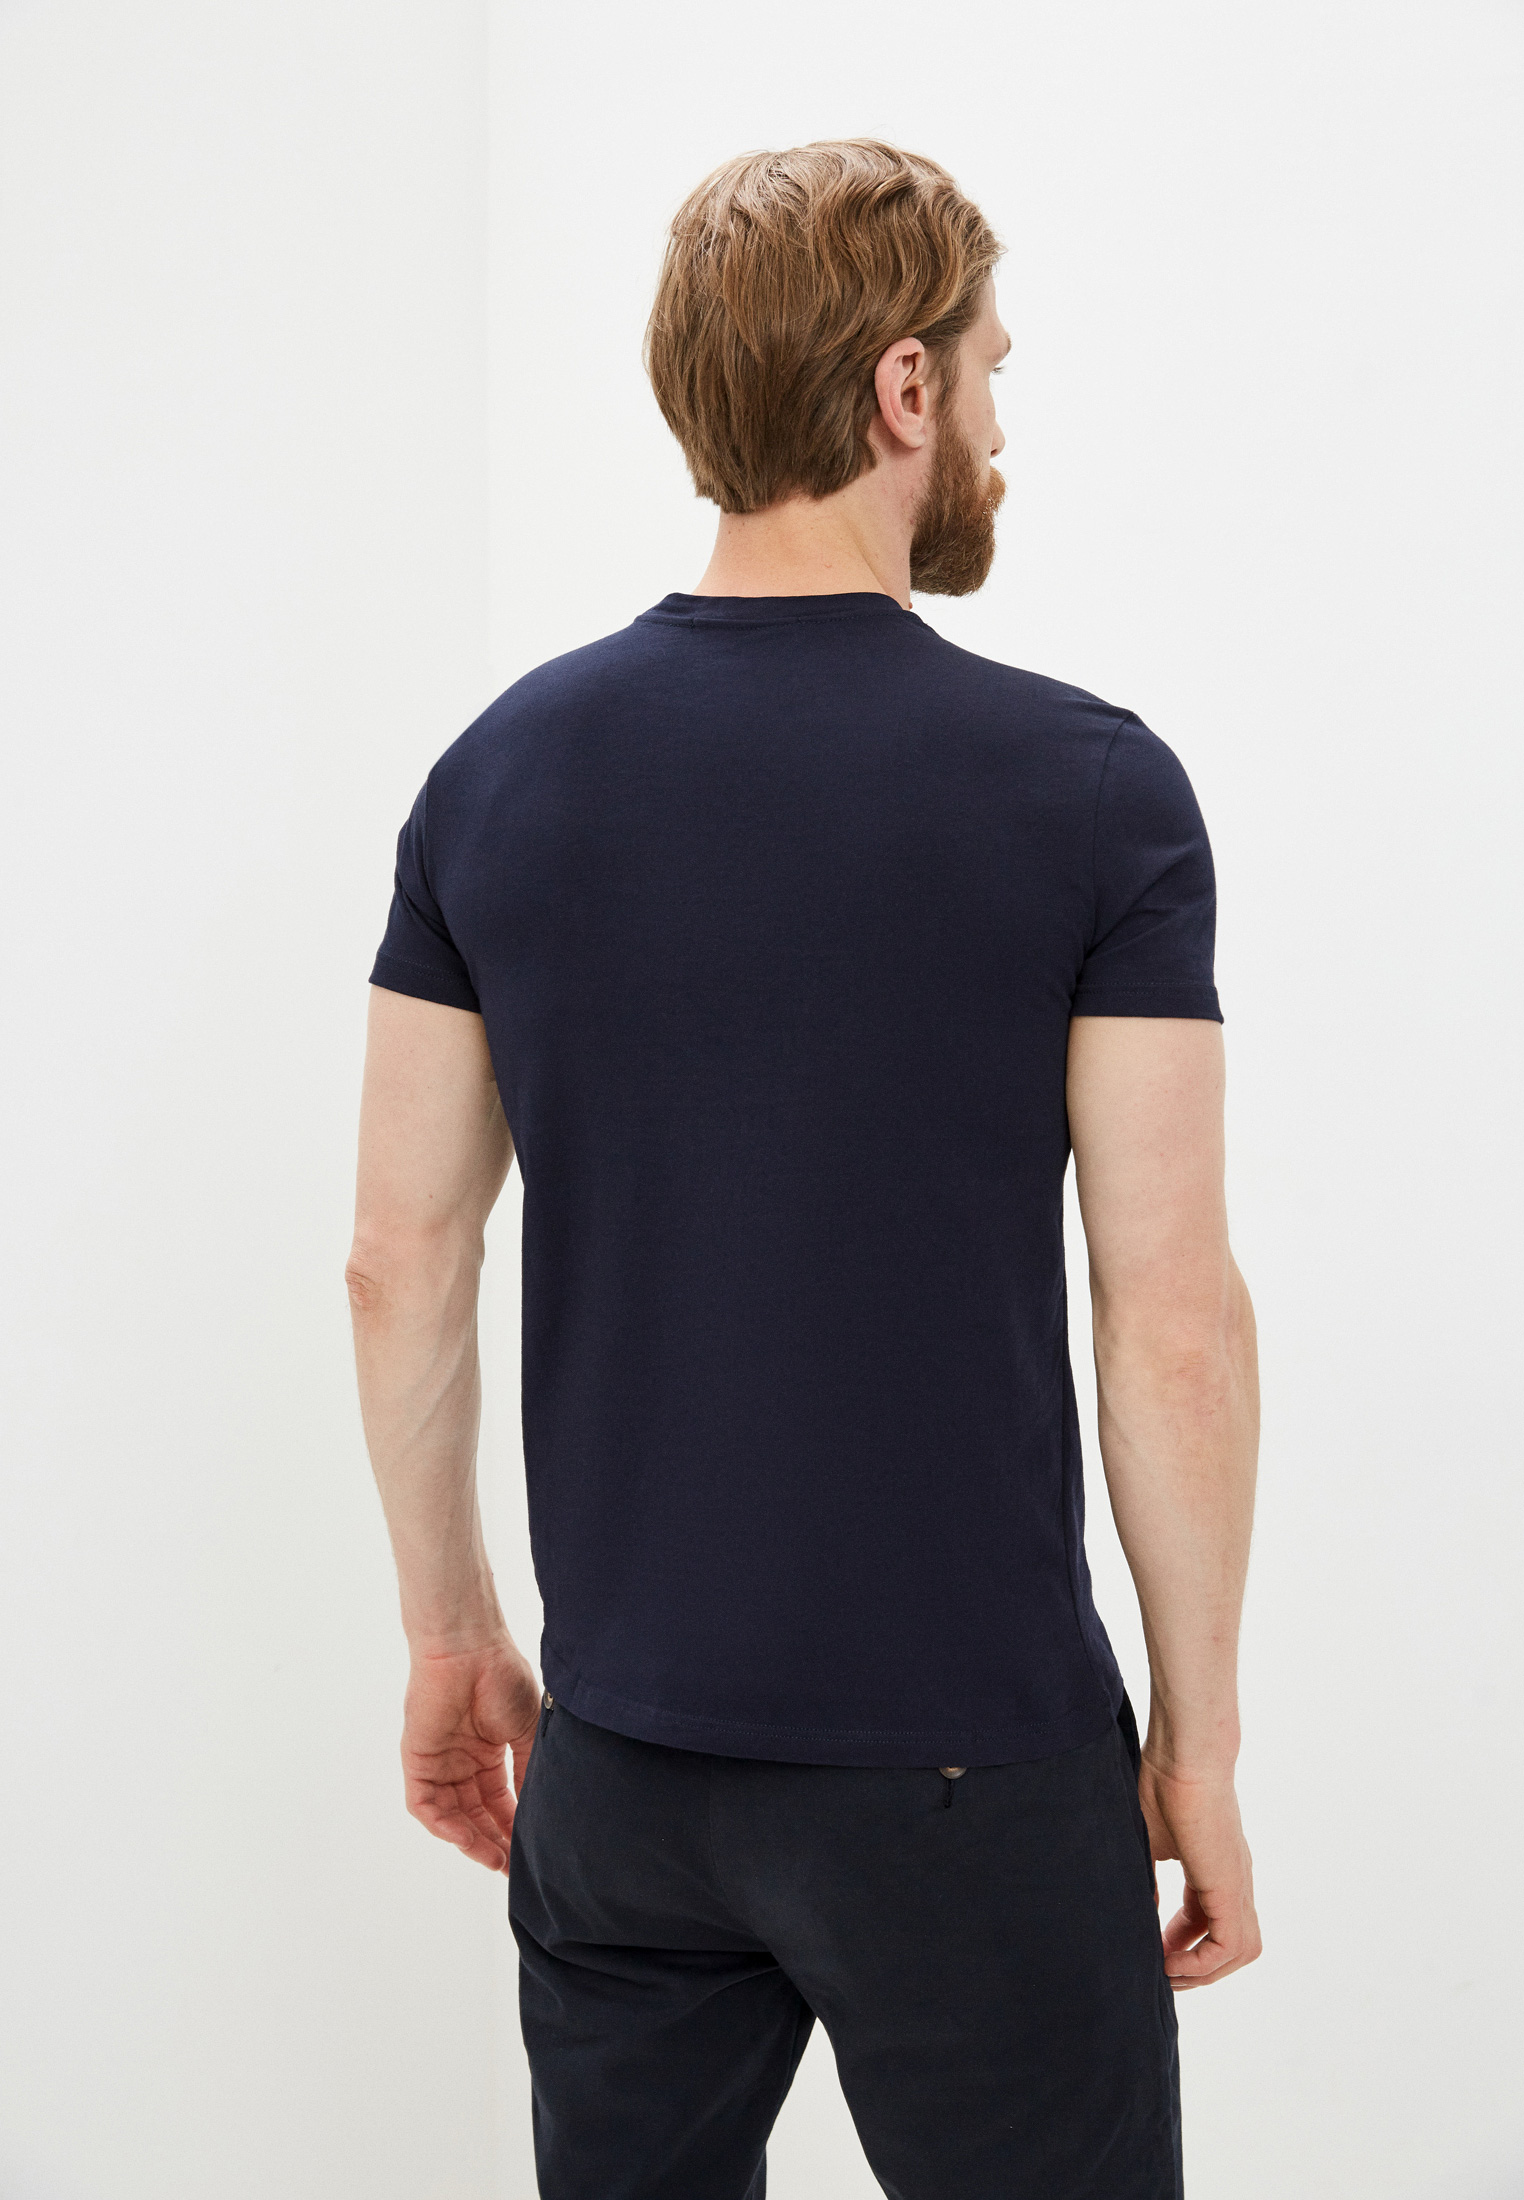 Мужская футболка Roberto Cavalli (Роберто Кавалли) GST655A027: изображение 9